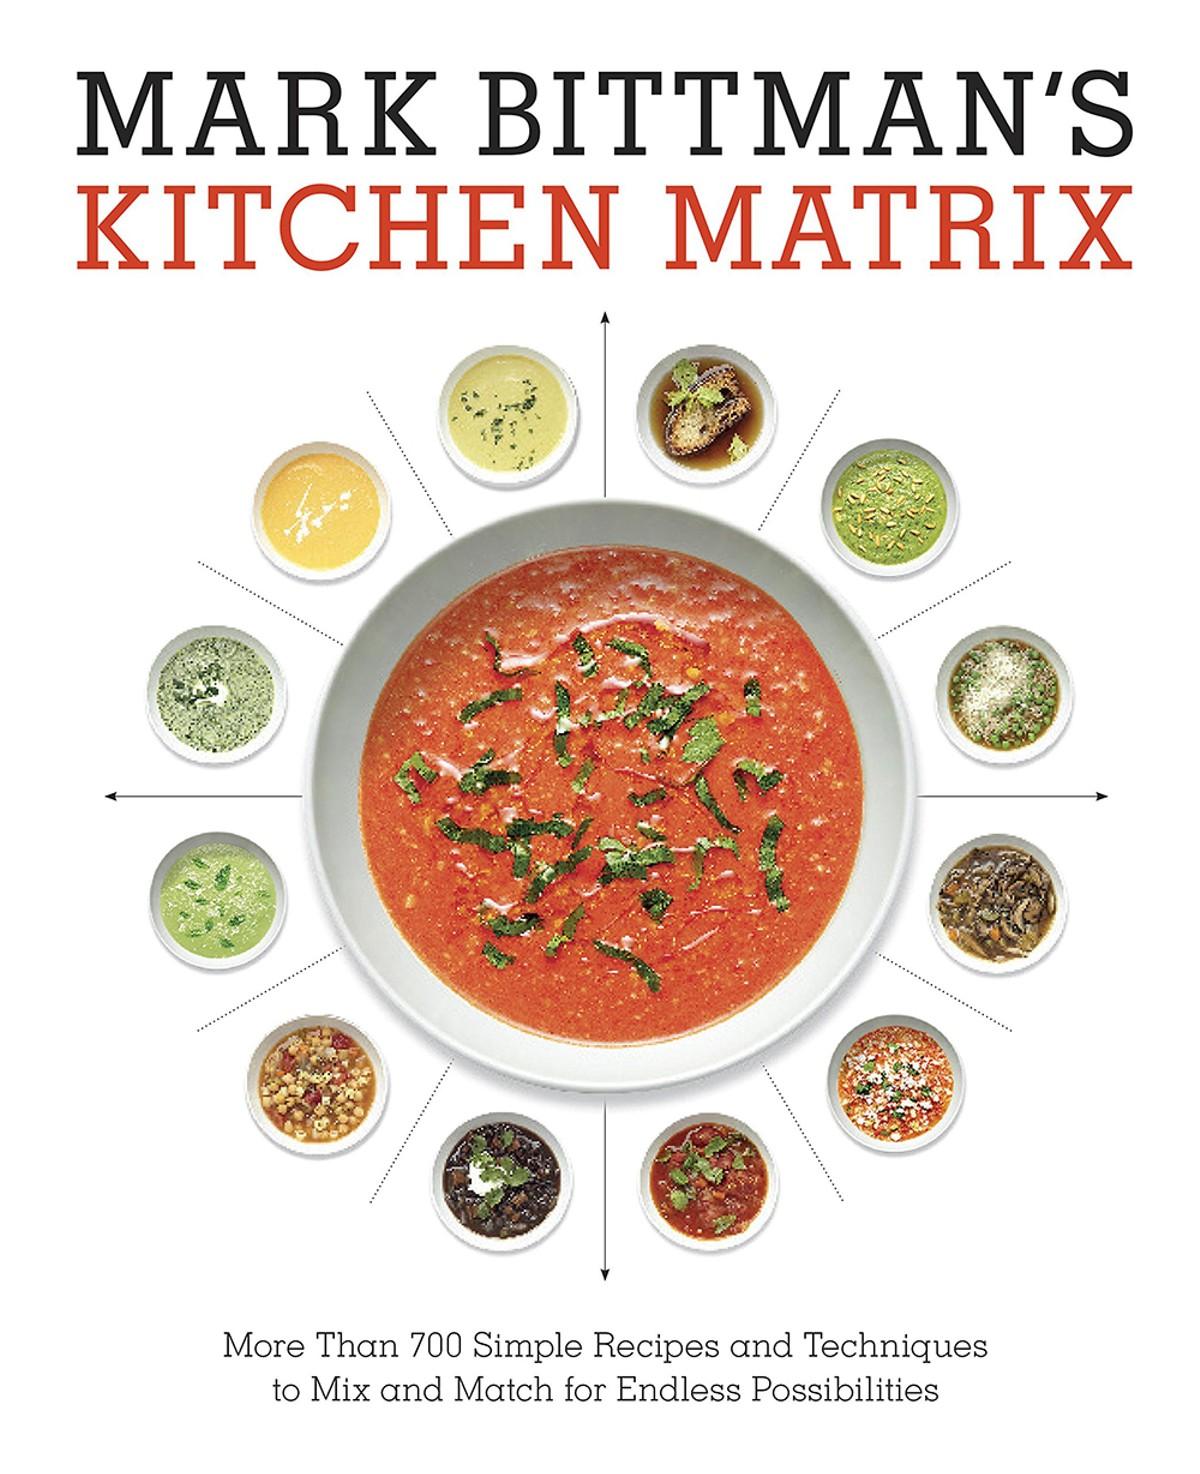 1000w_head-kitchen_matrix.jpg